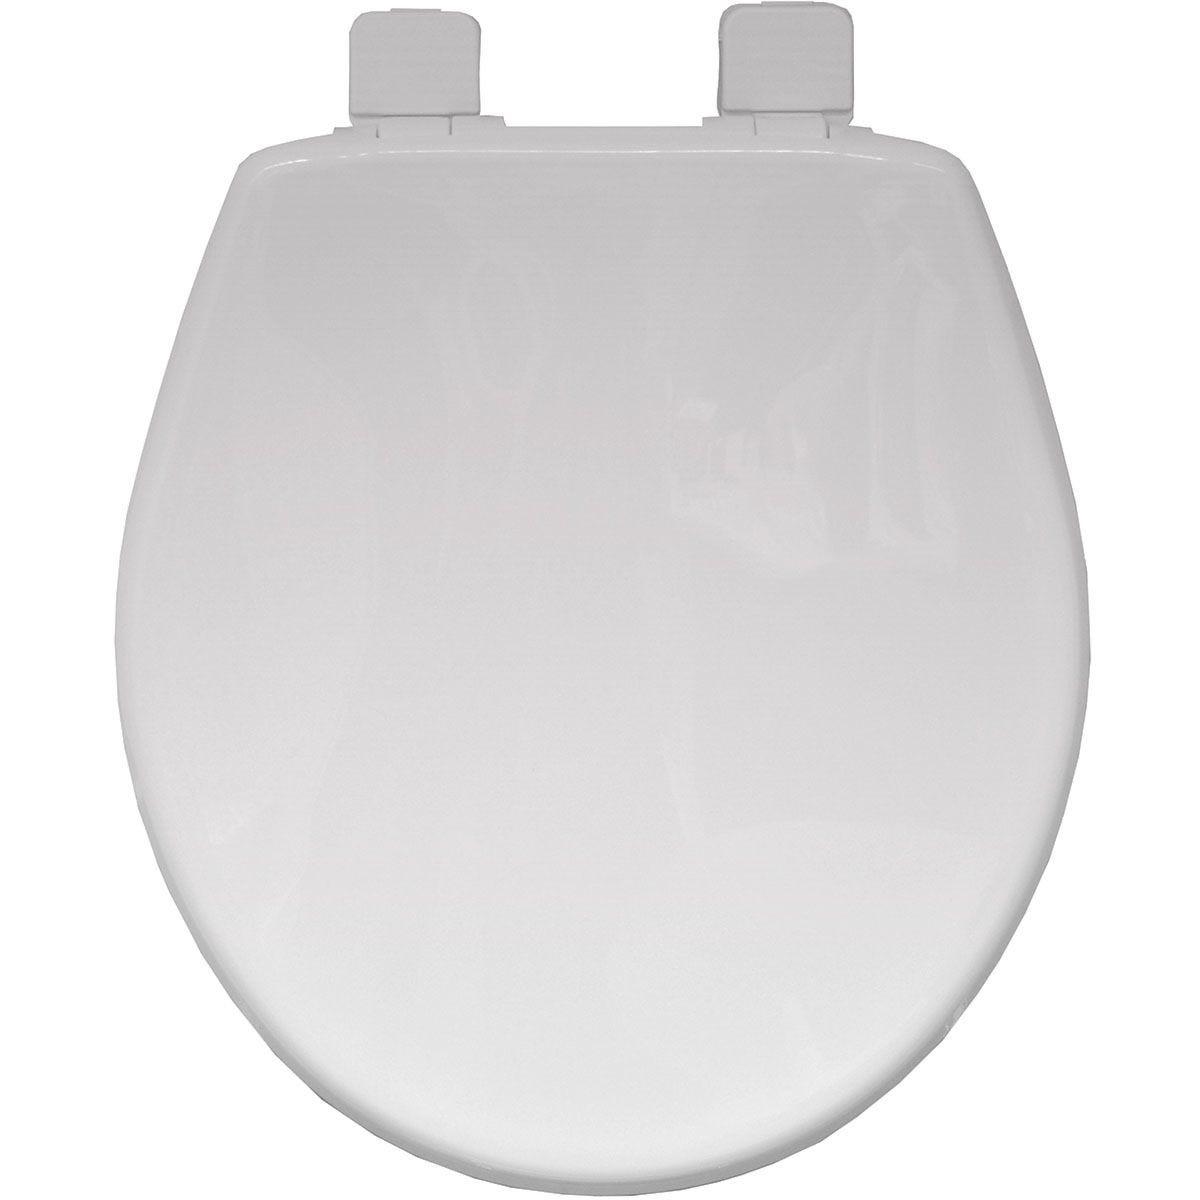 Bemis Thermoplastic Upton Statite Slow Close Toilet Seat